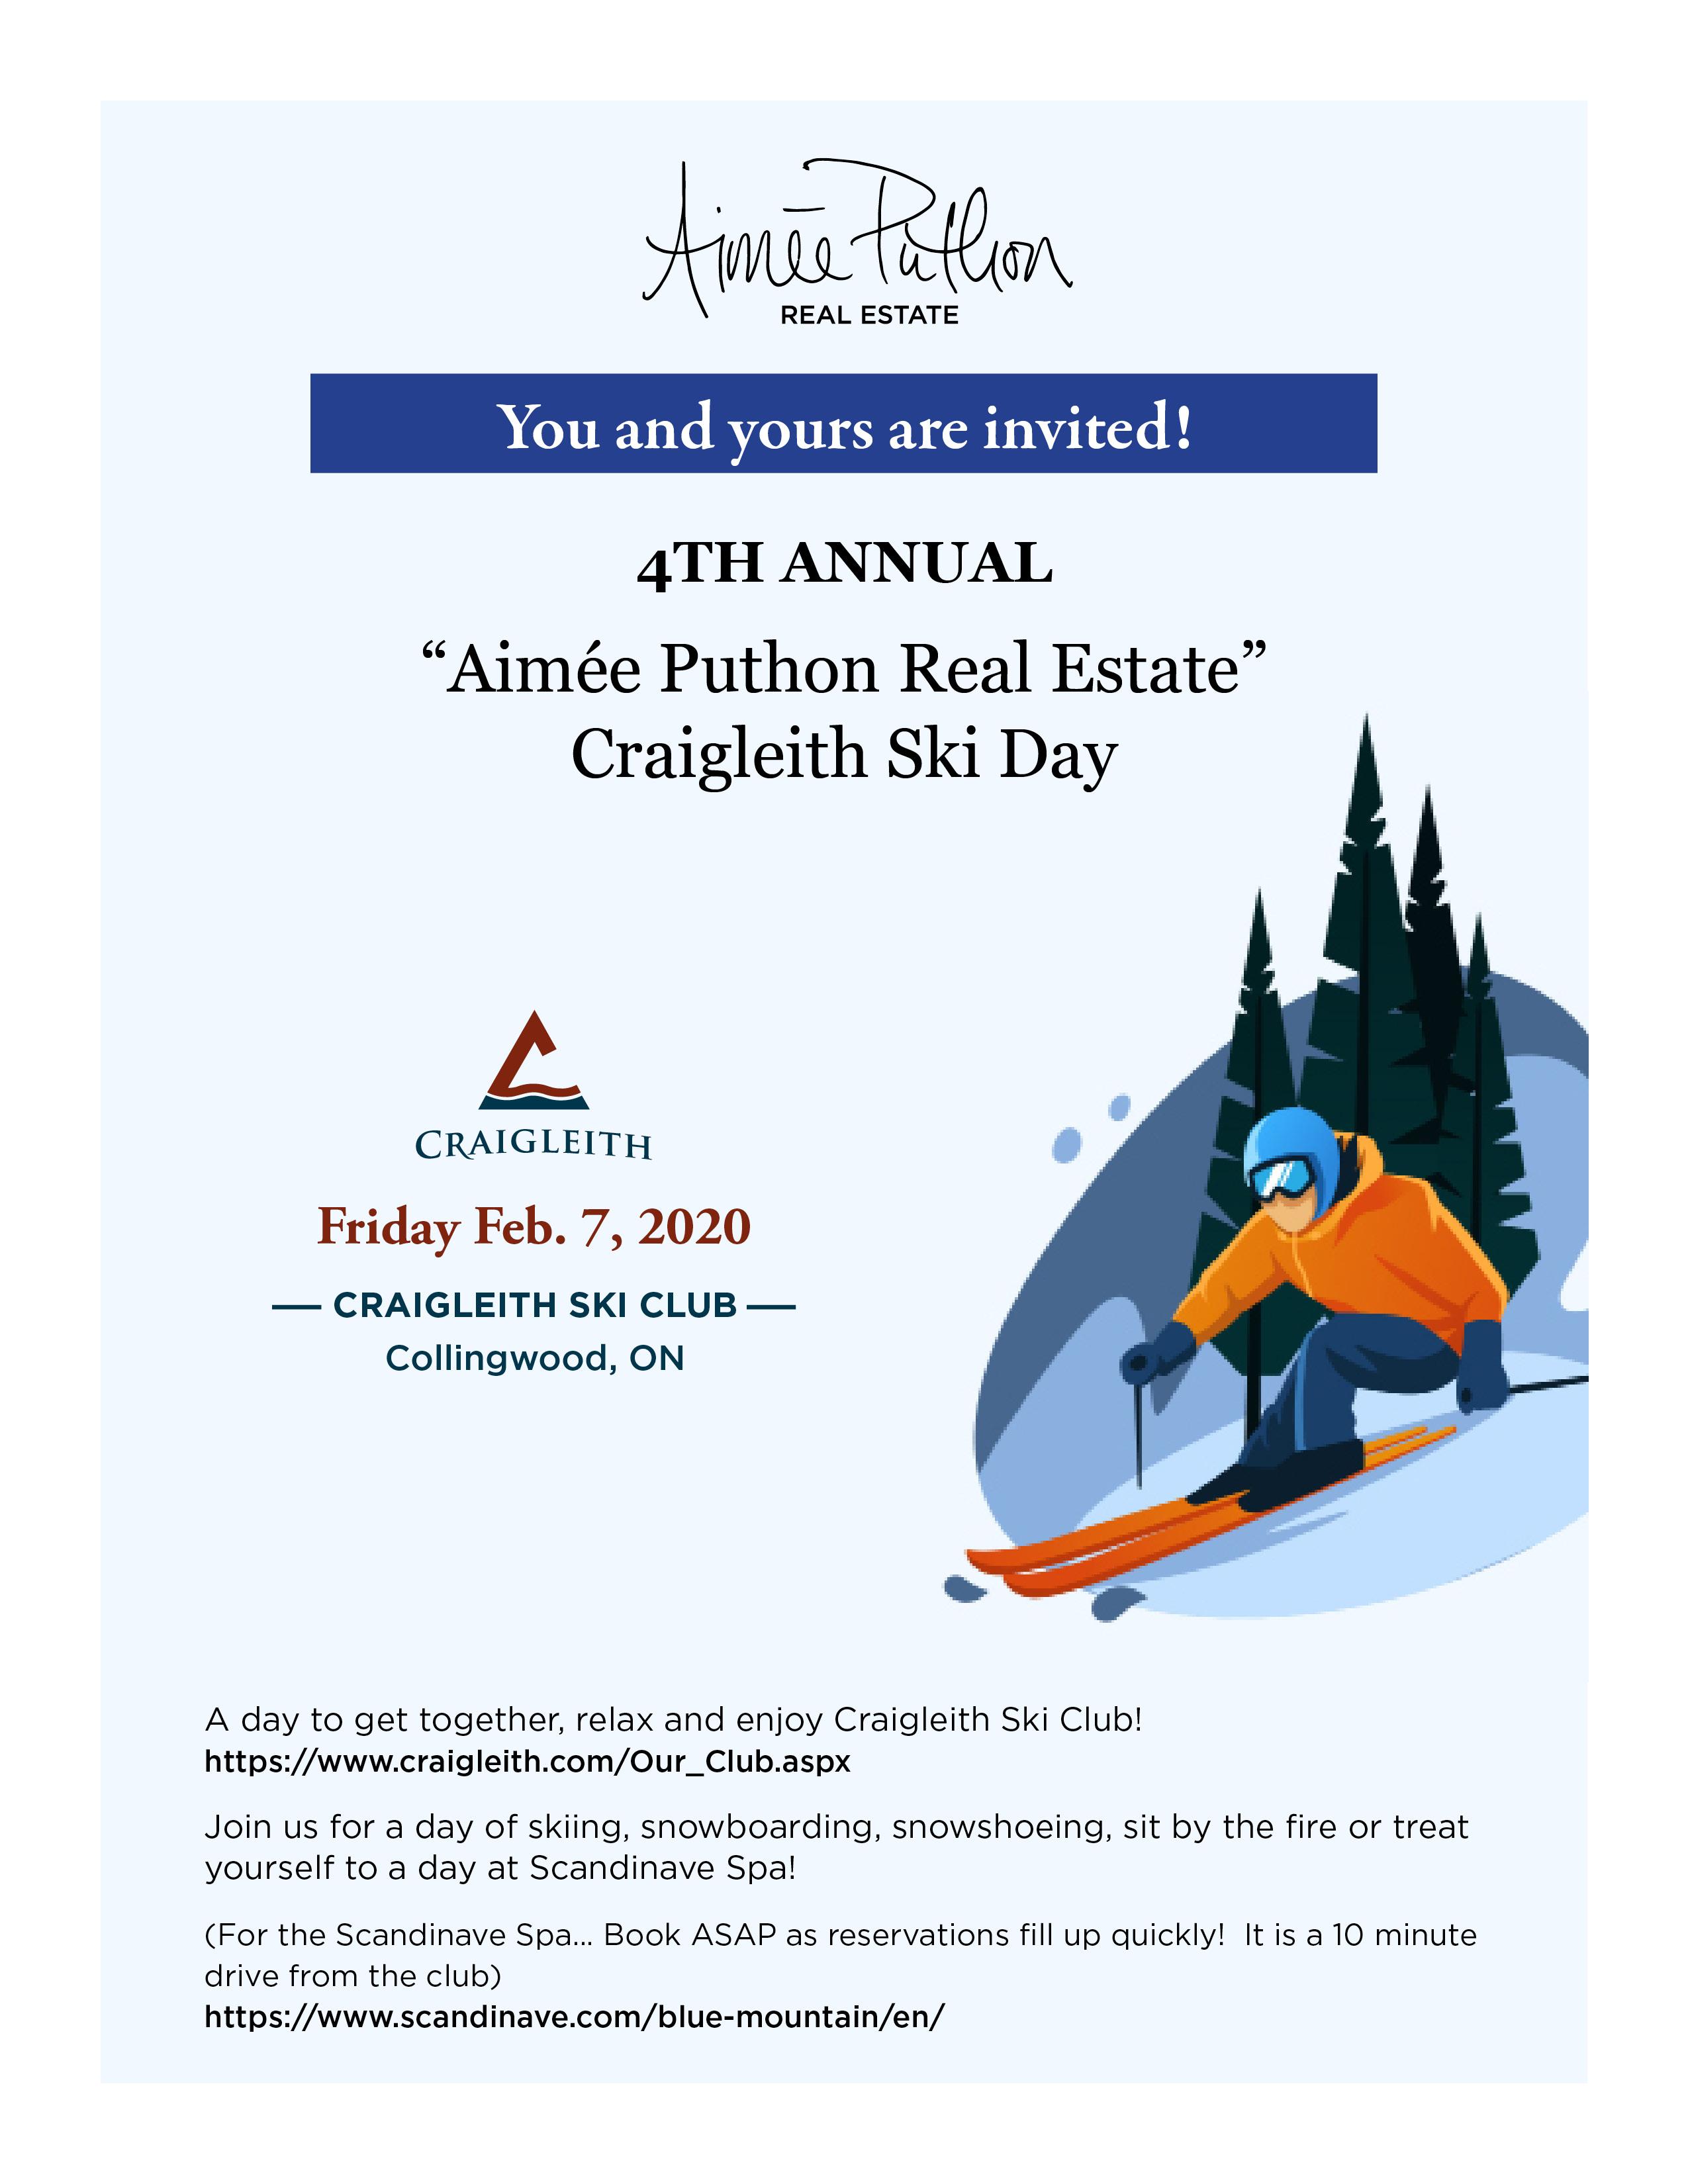 Aimee Puthon Real Estate Ski Day 2020